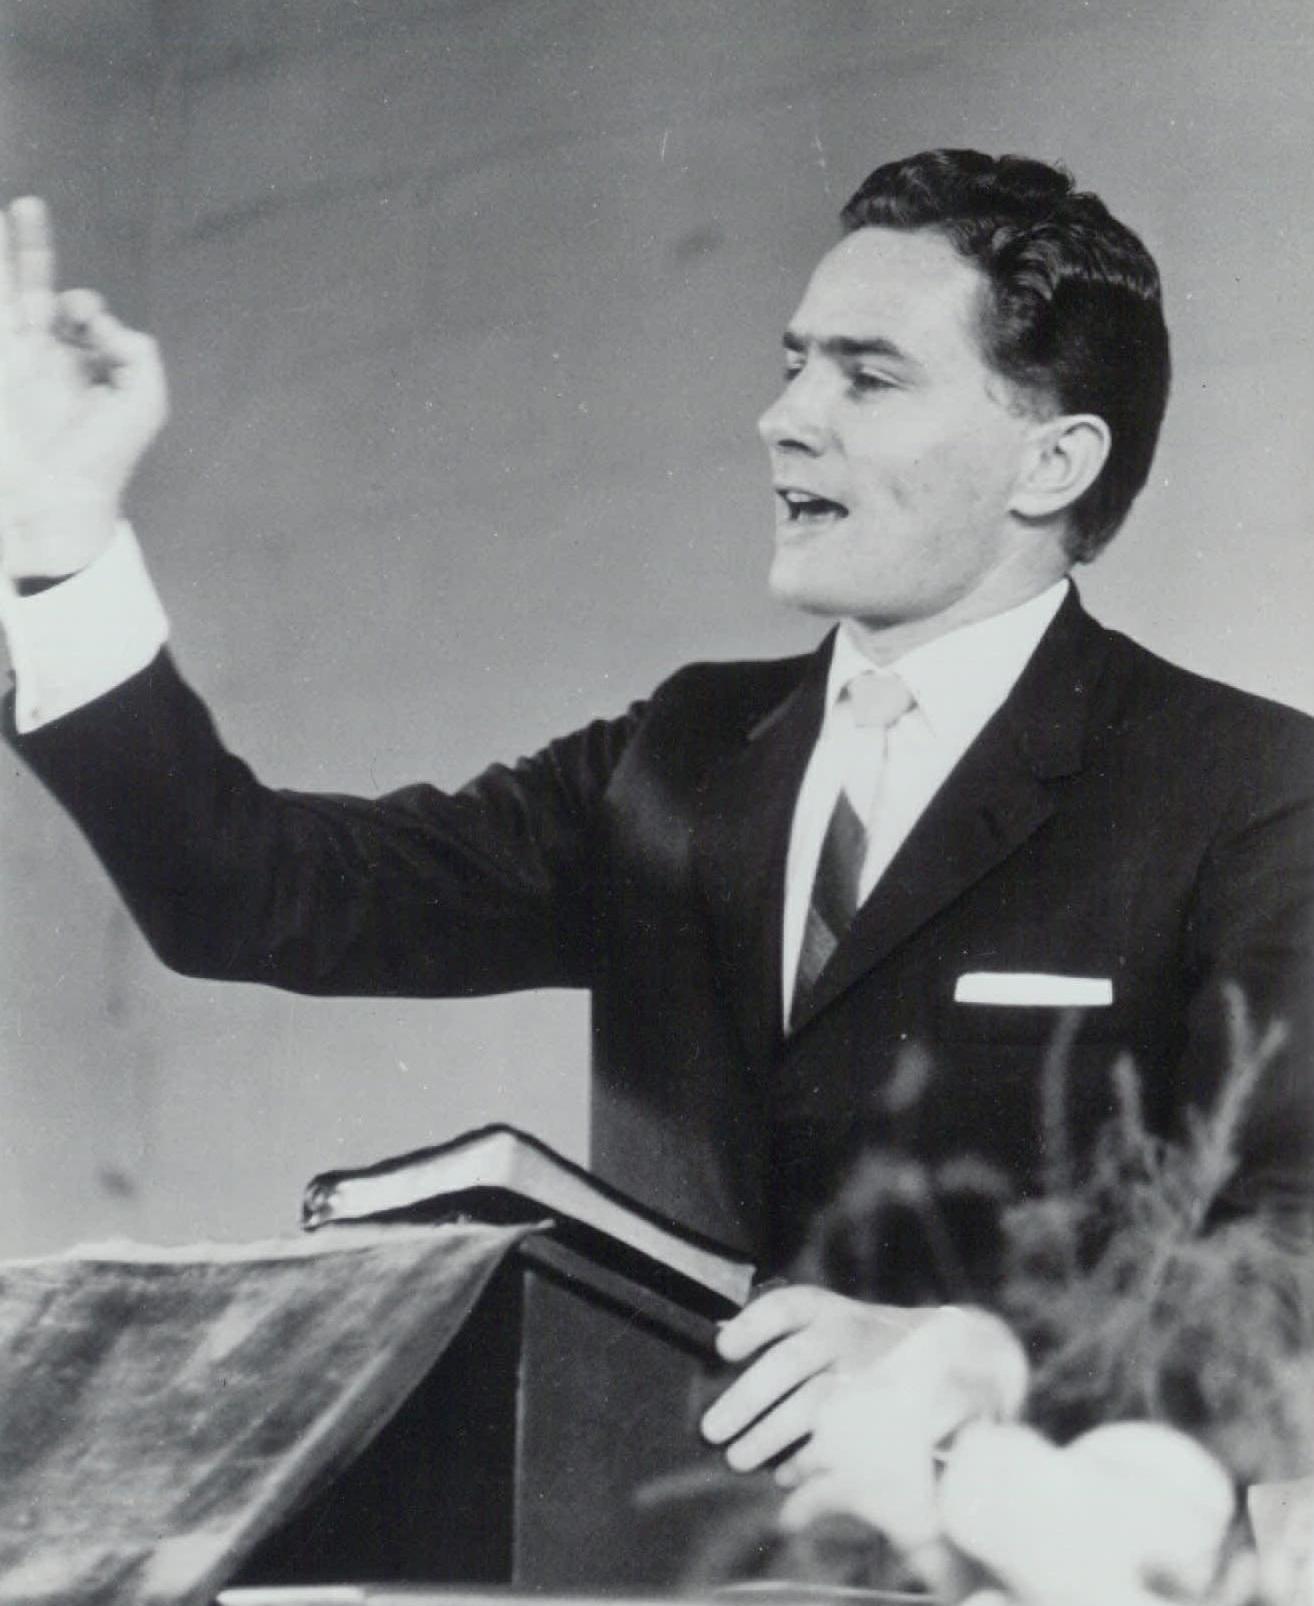 Luis preaching in Monterrey, Mexico (1968).